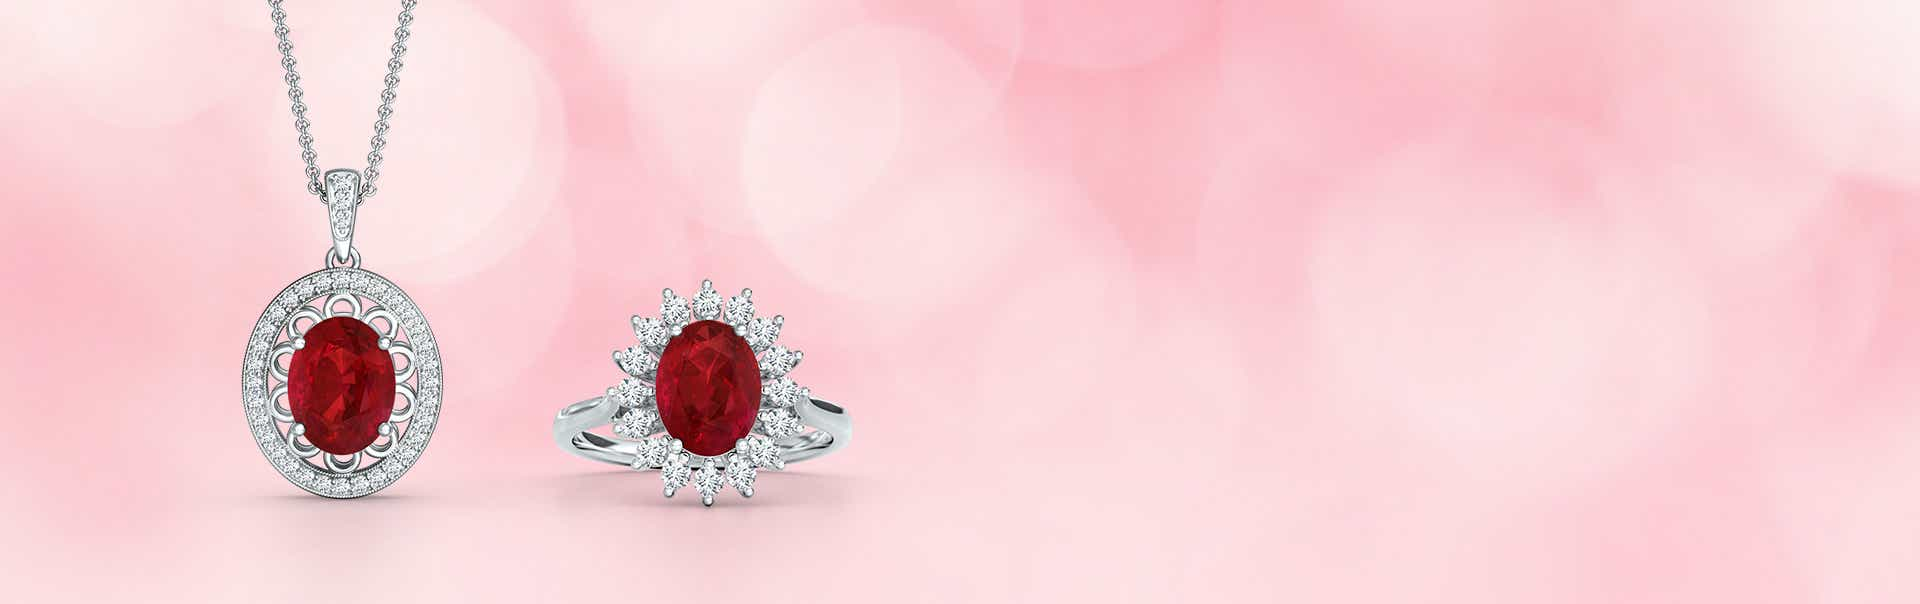 Explore Ruby Jewelry